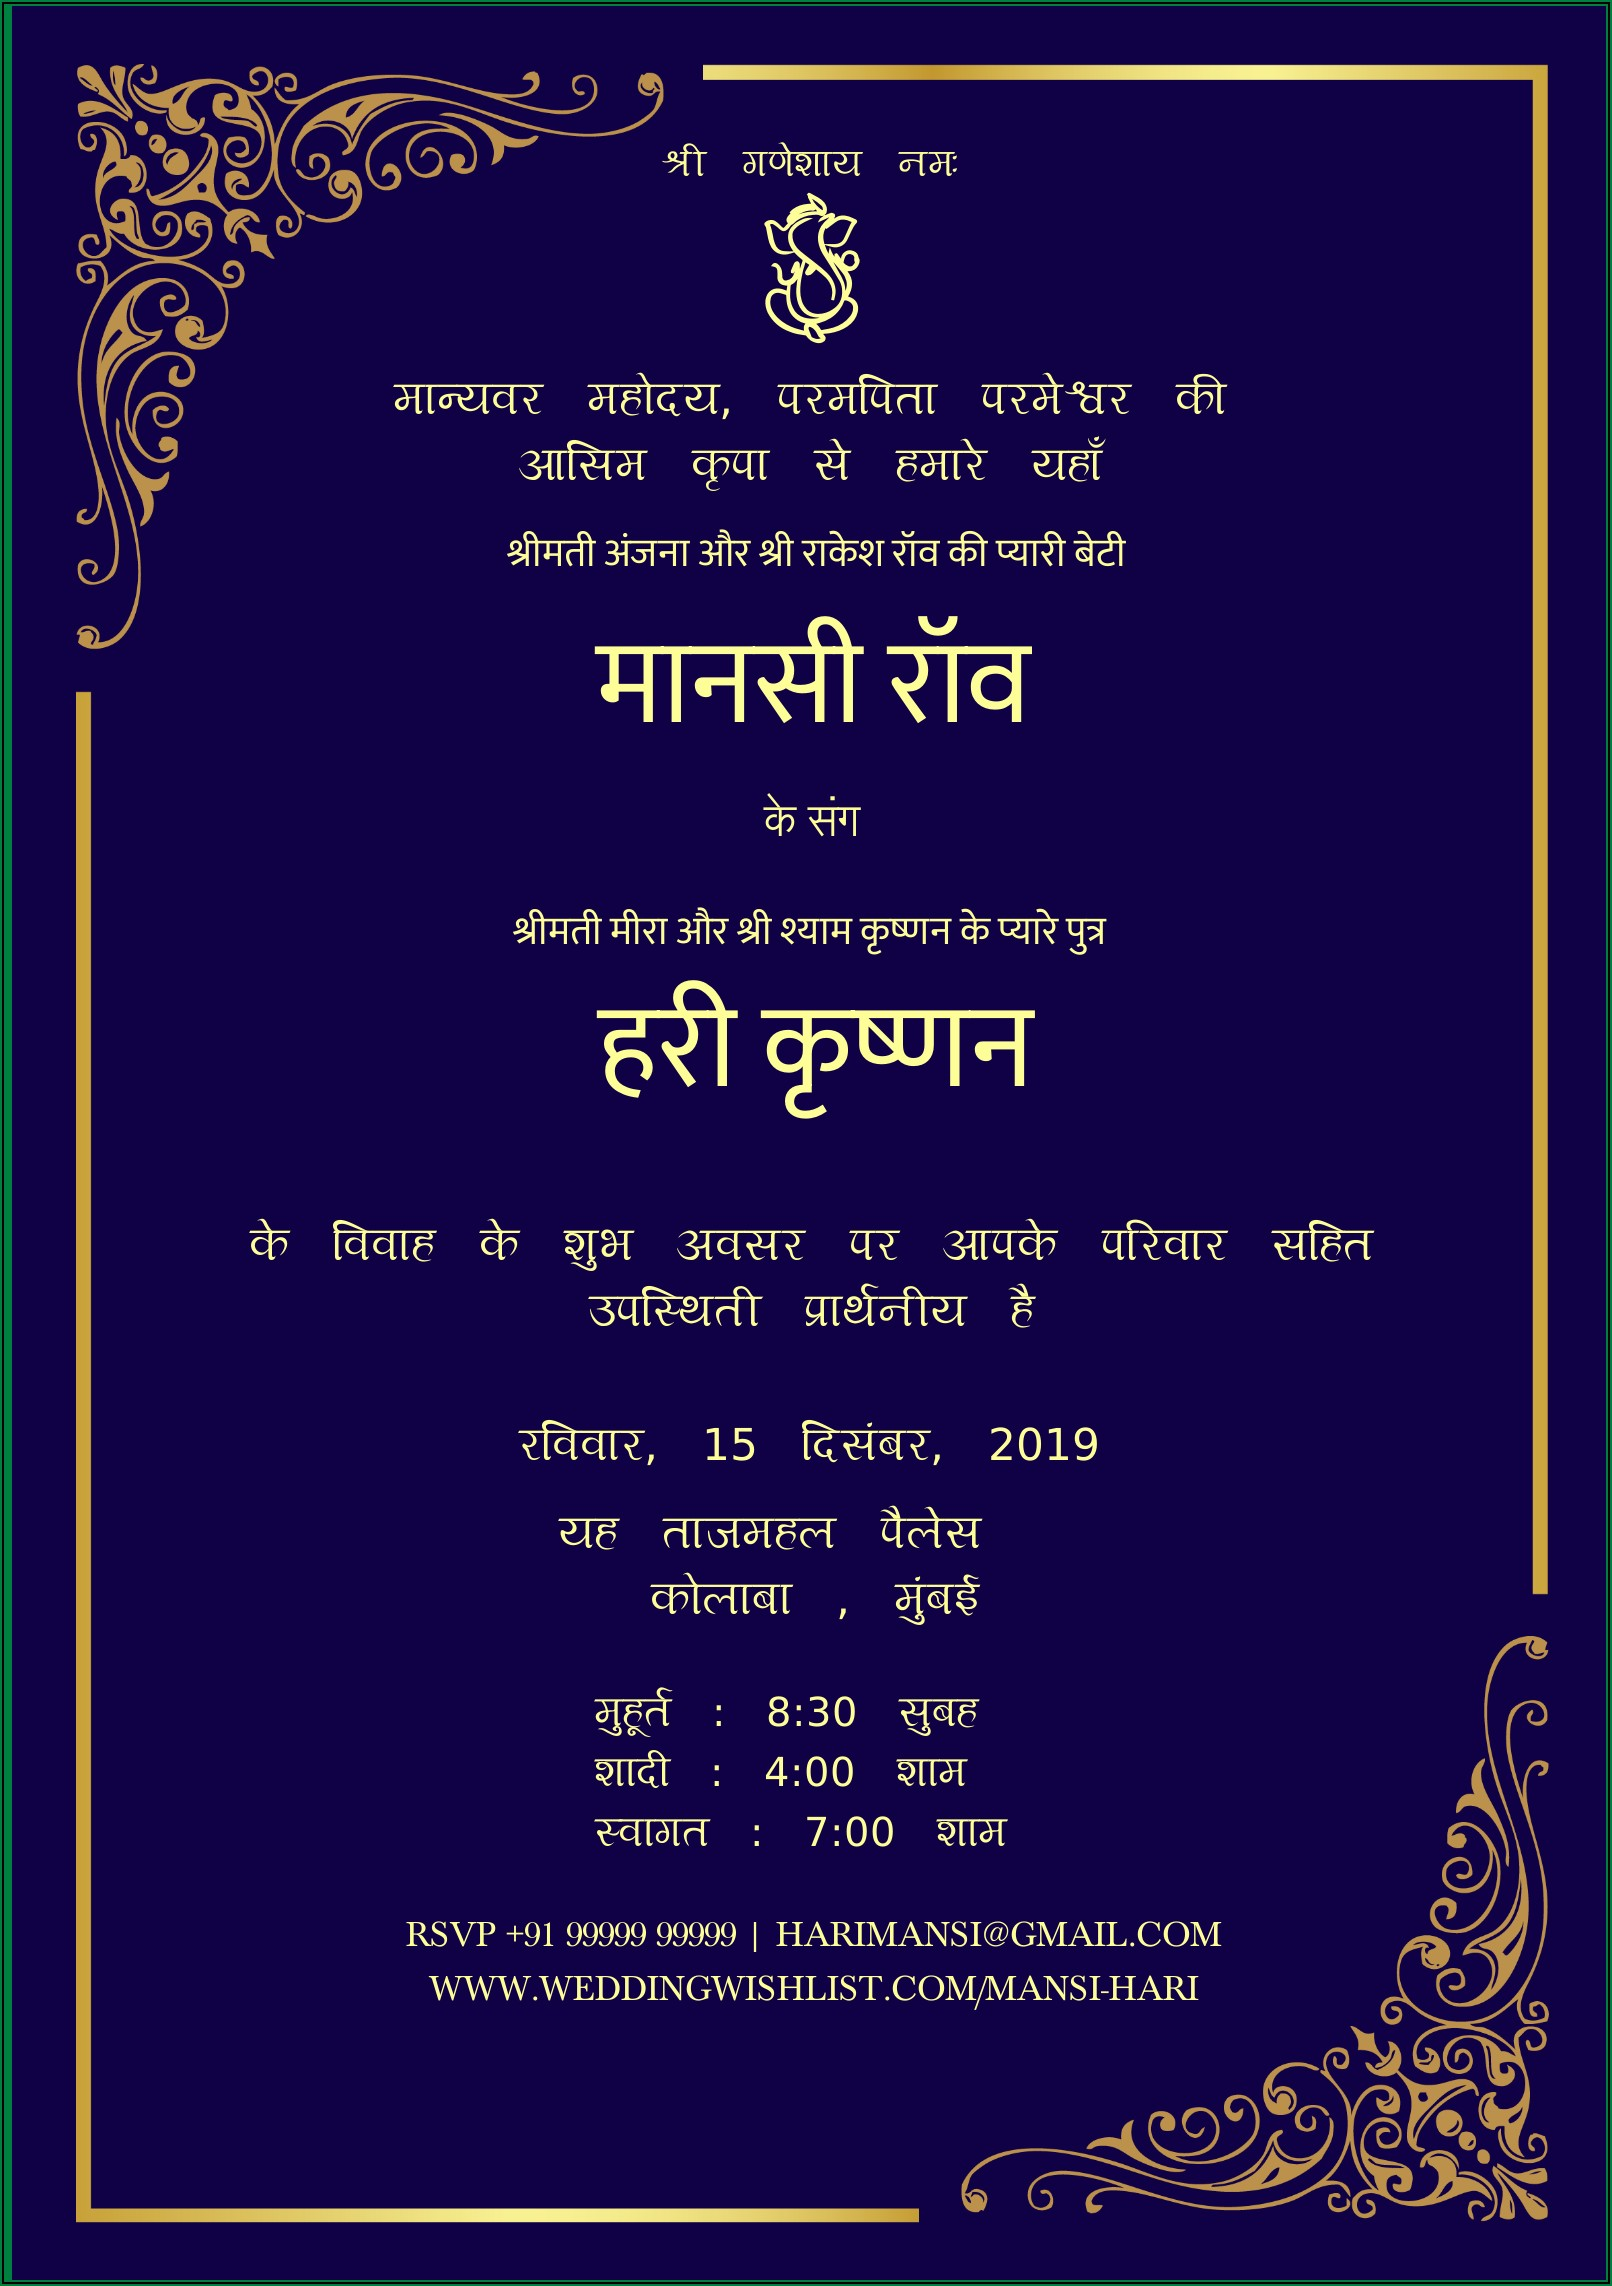 Indian Wedding Invitation Card Format In Hindi